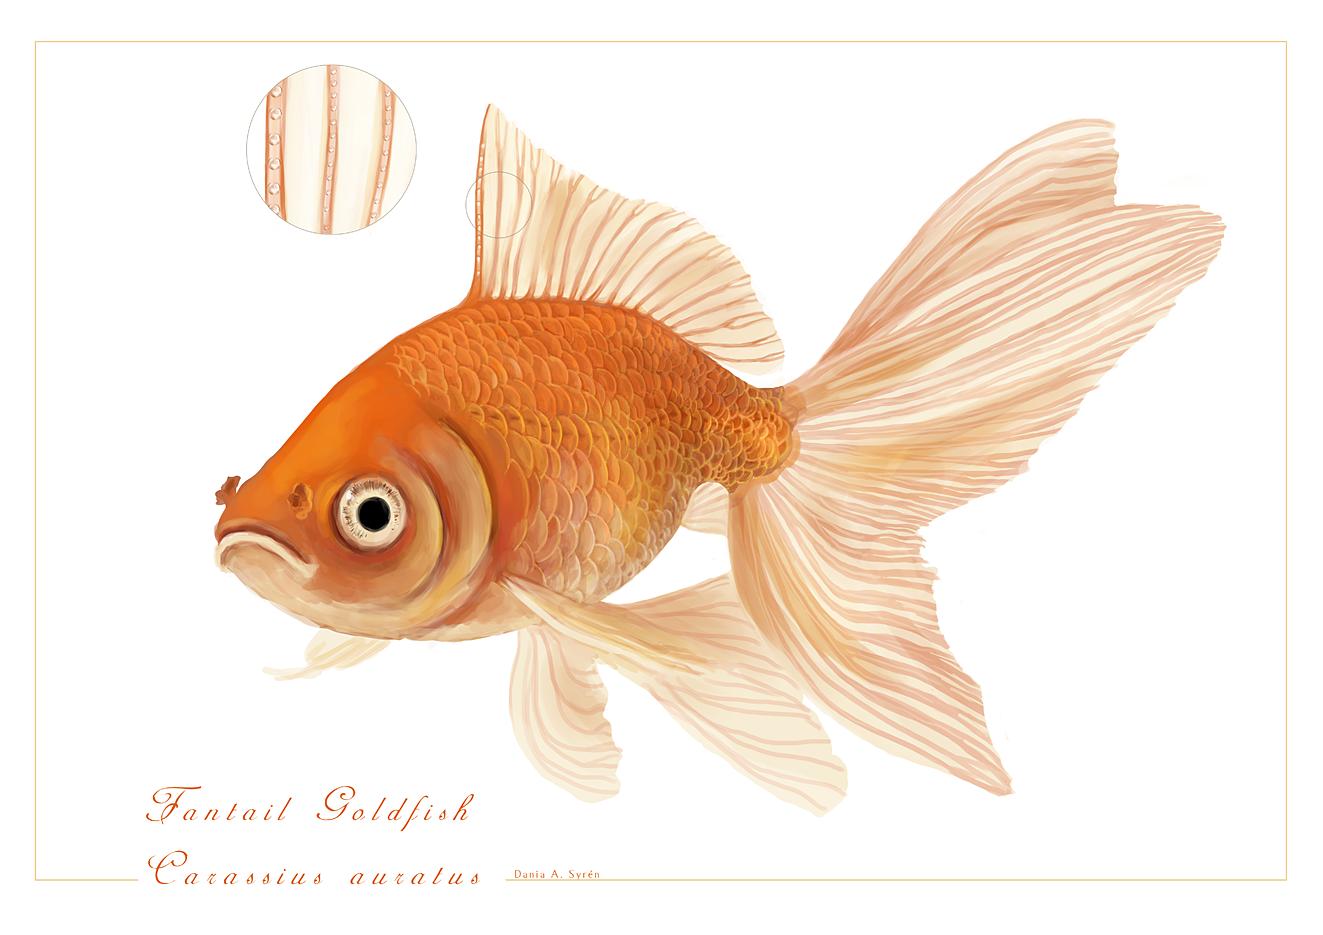 Fantail Goldfish -  Carassius auratus by rainytown